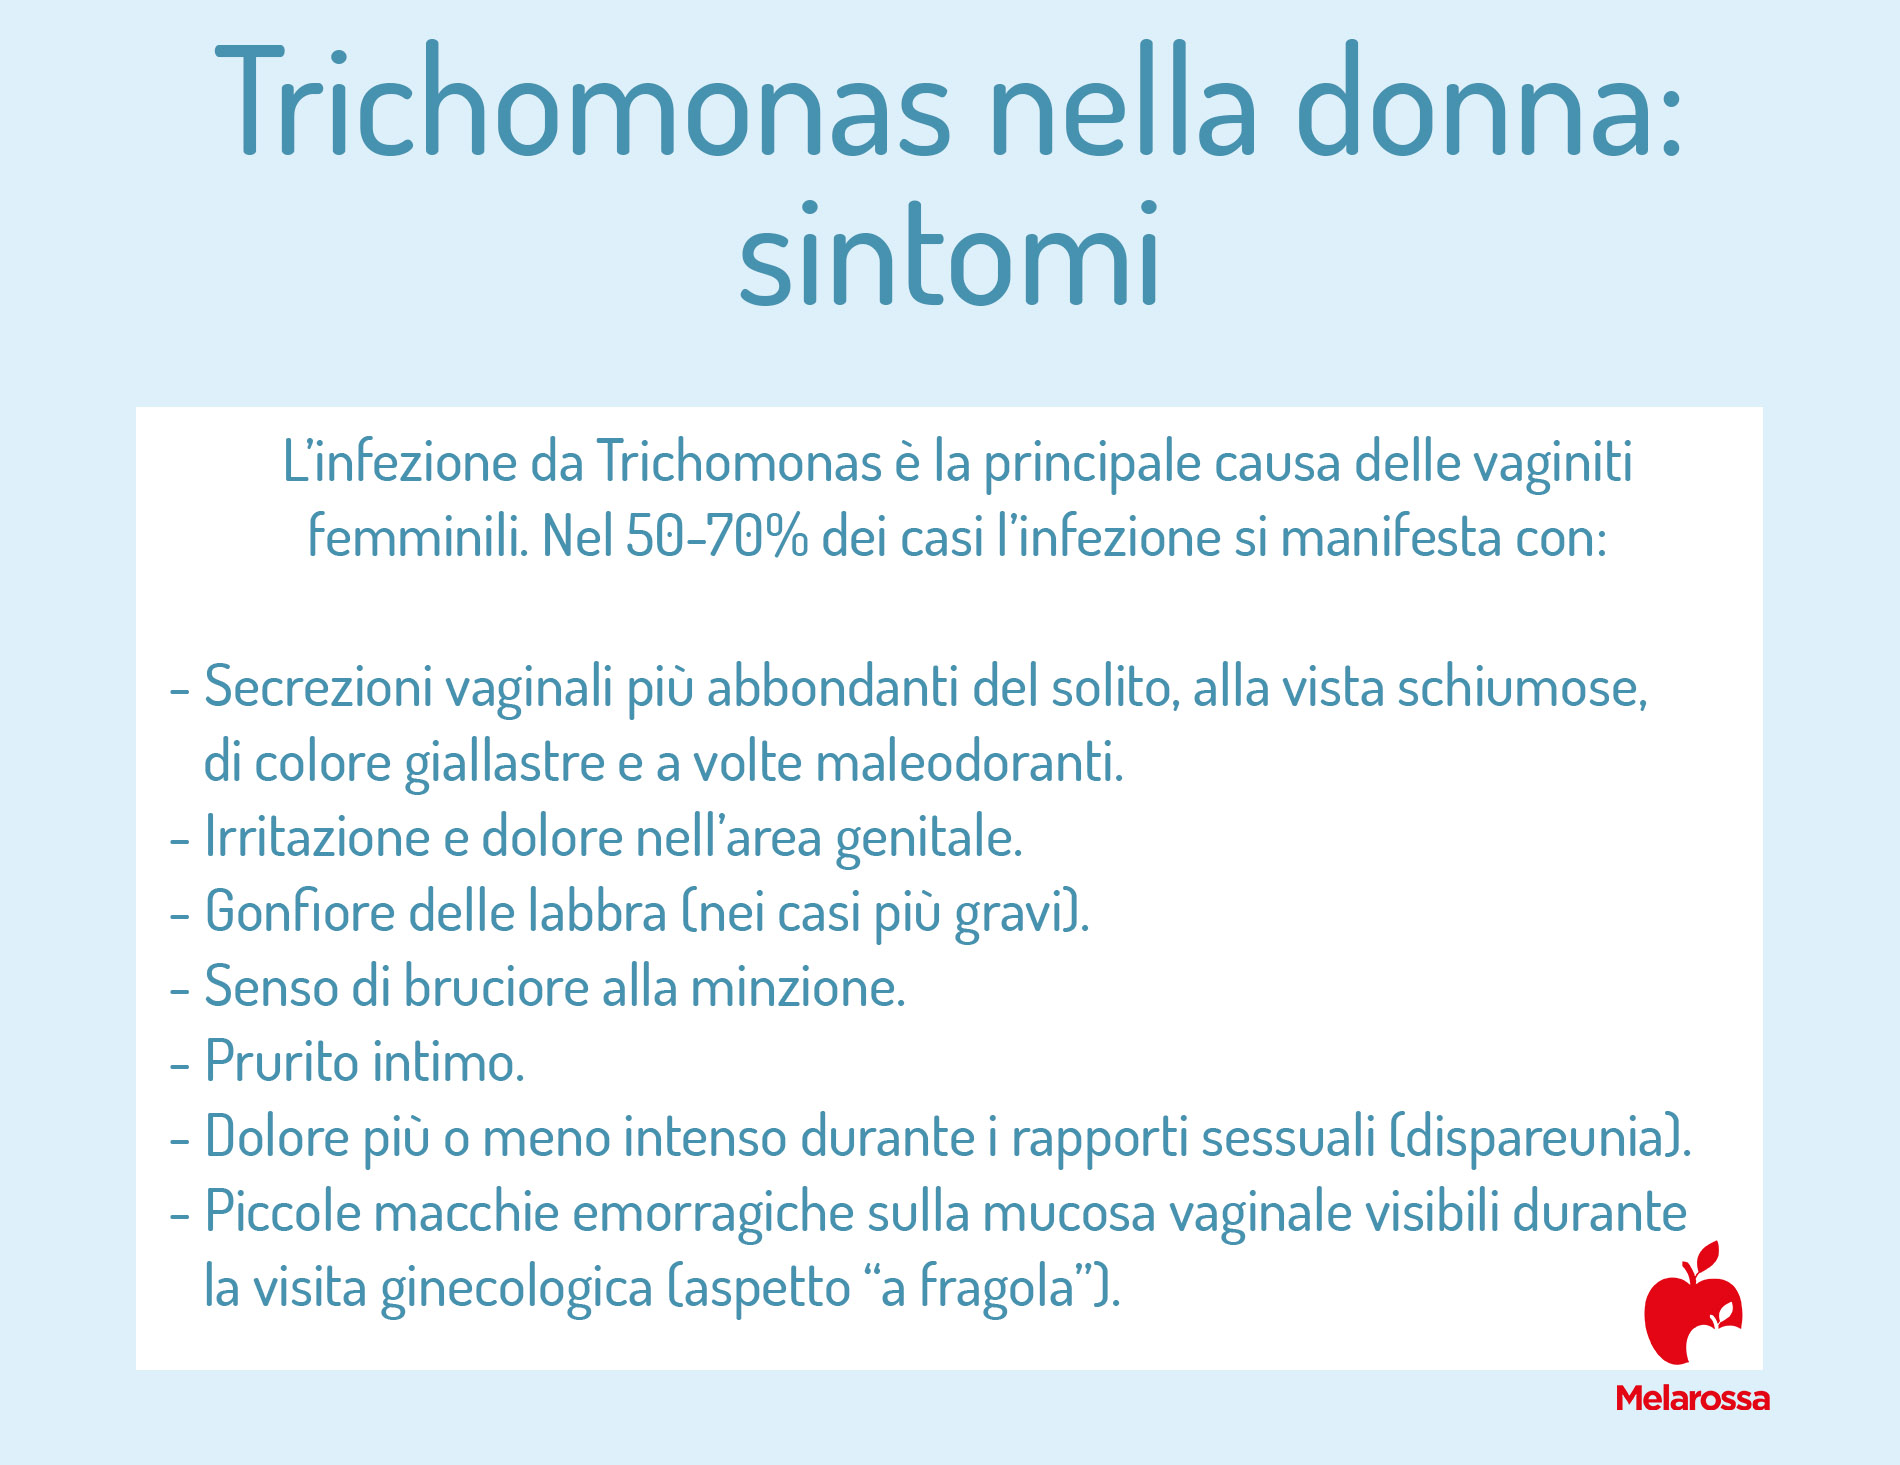 tricomoniasi: sintomi nella donna